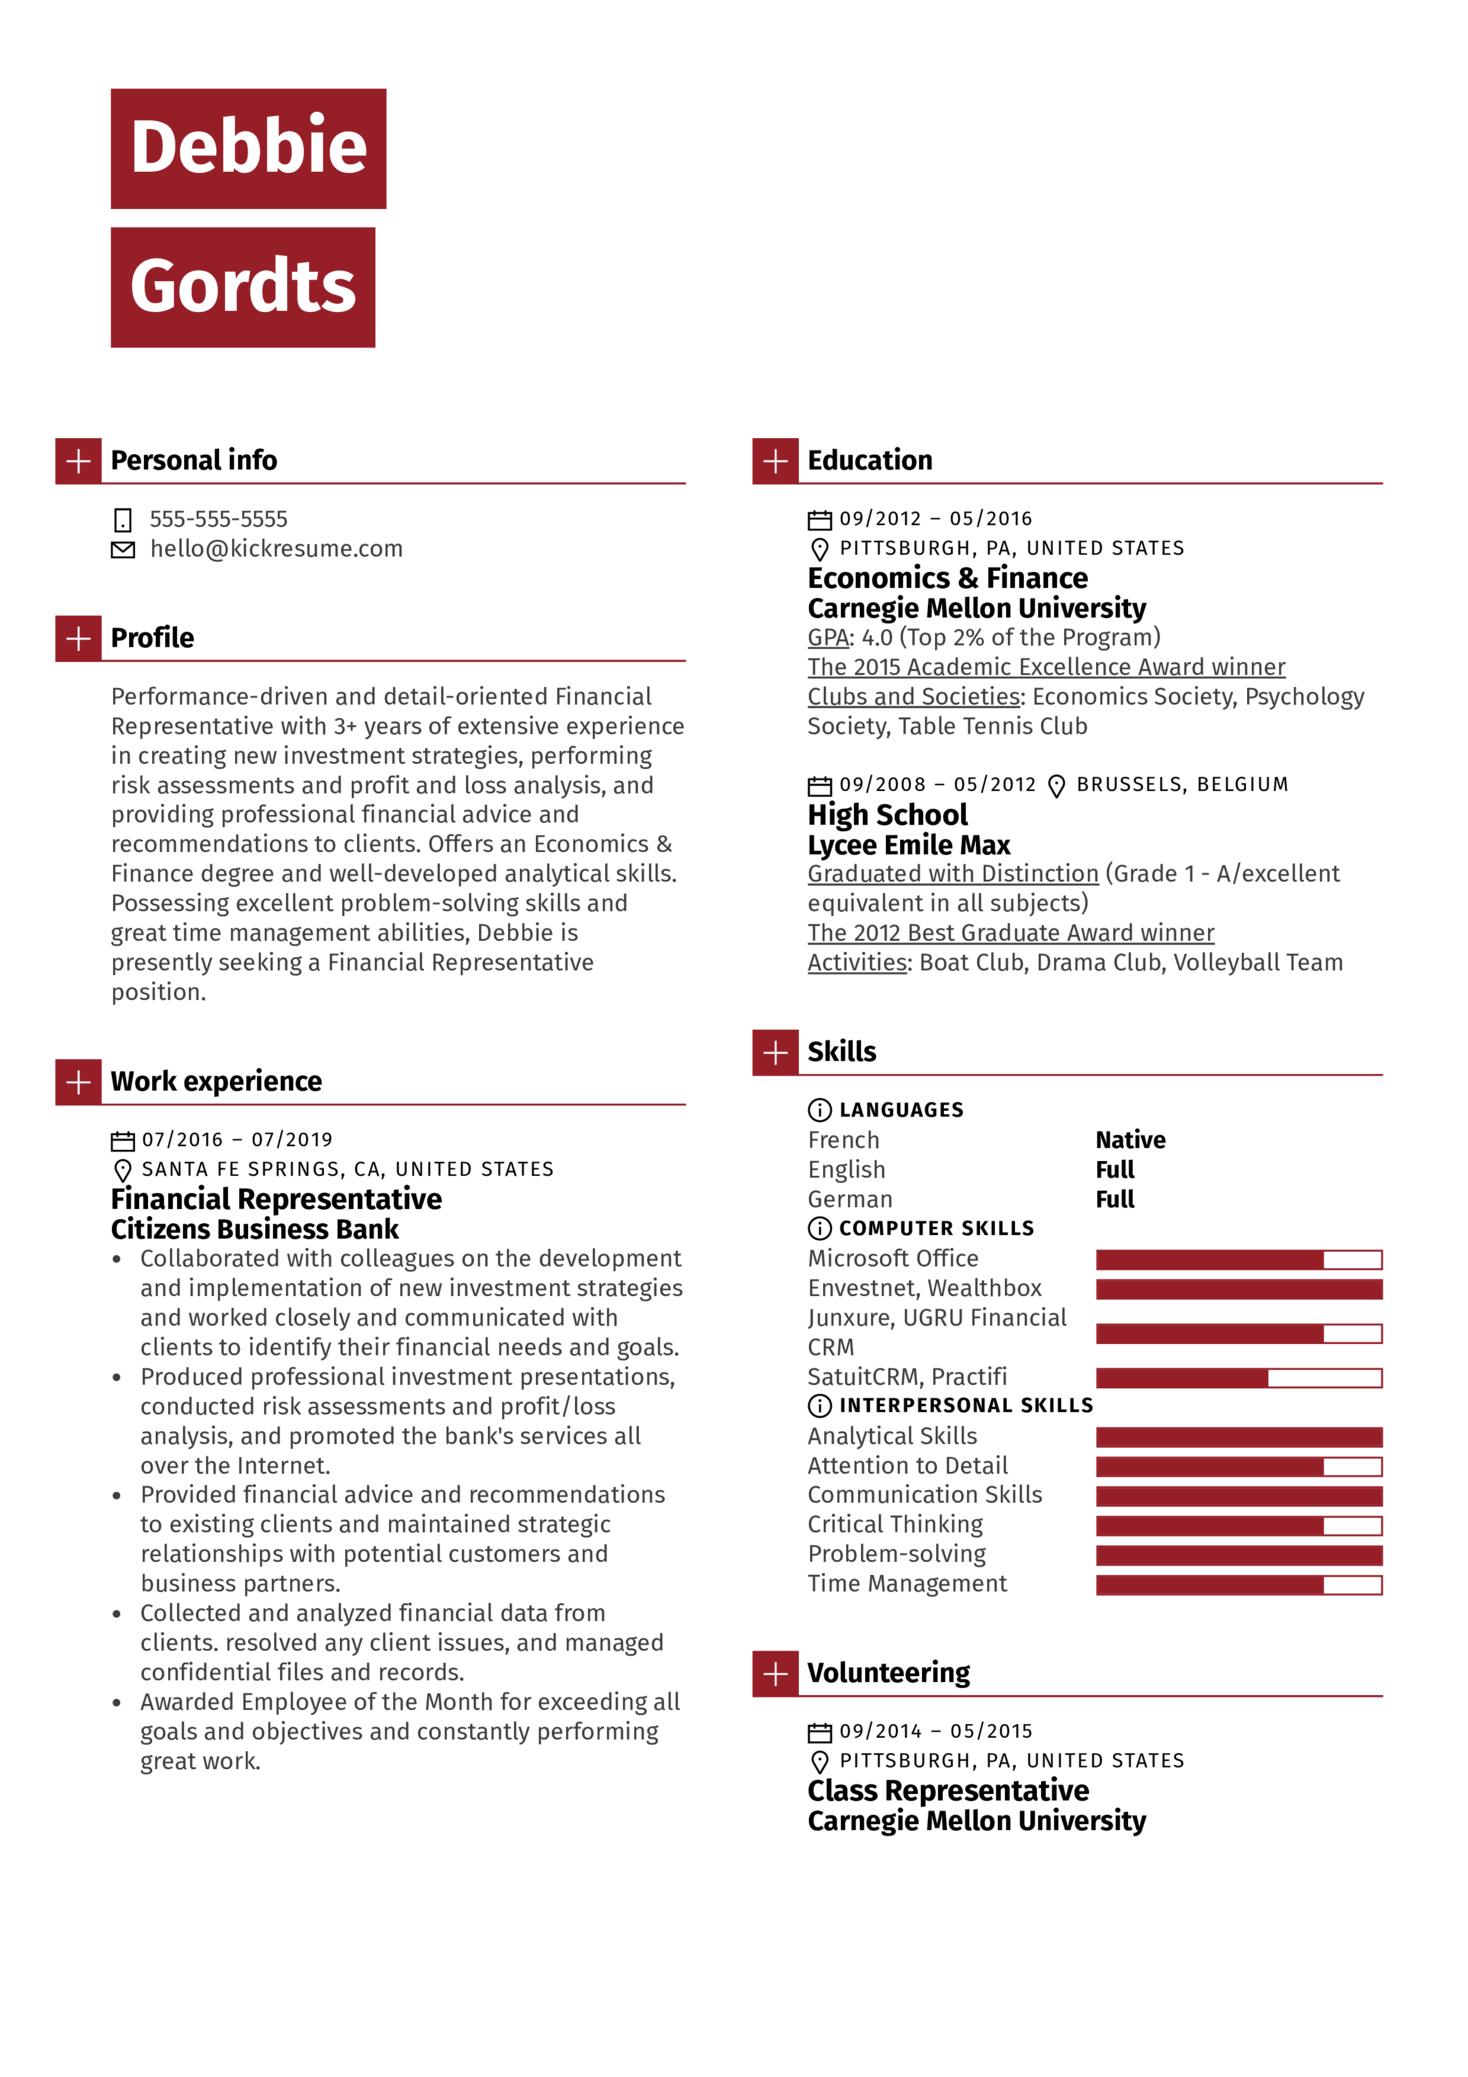 Financial Representative Resume Example (Part 1)